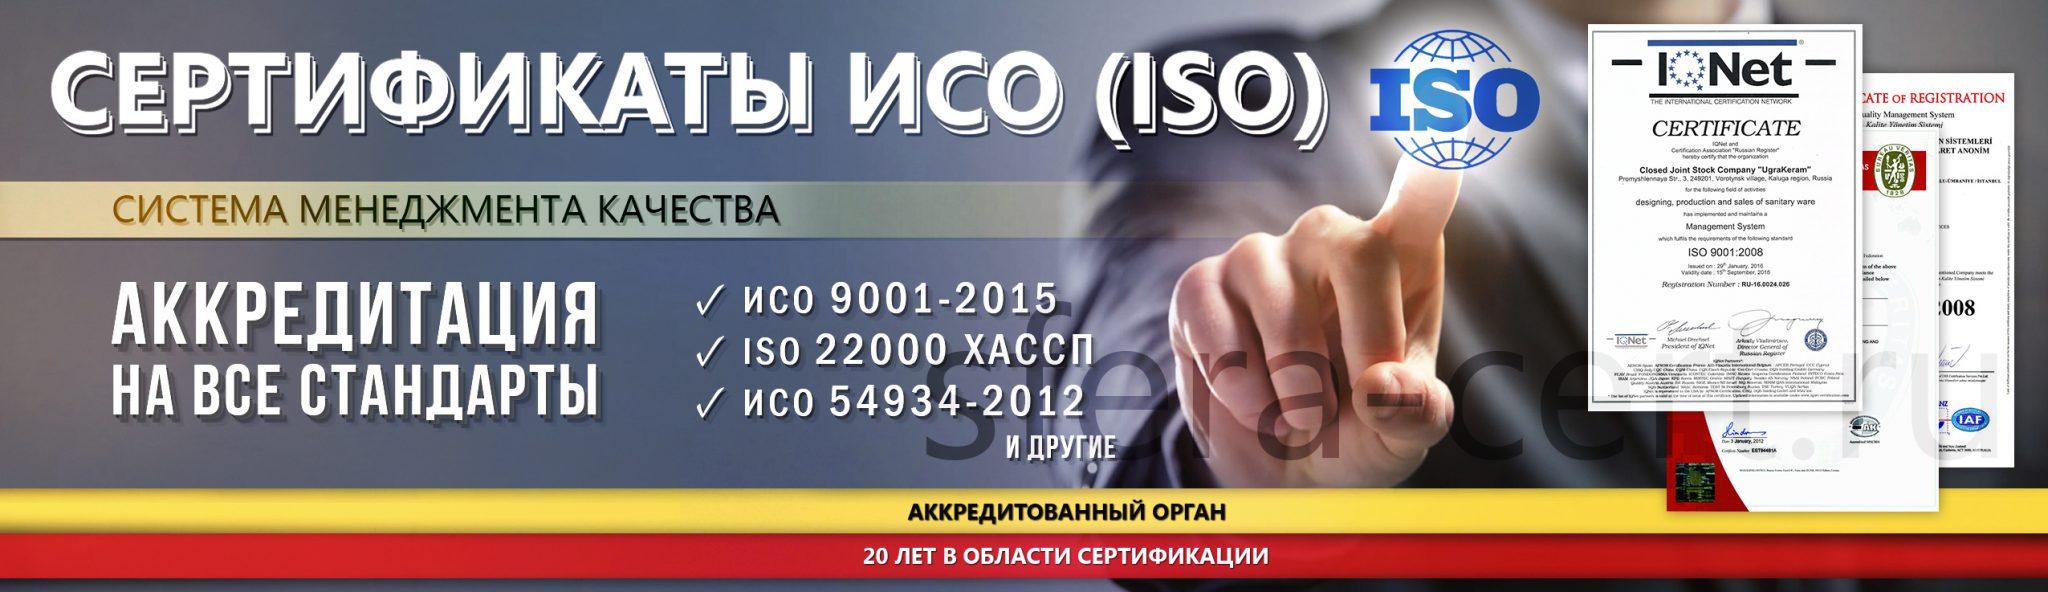 Сертификат ИСО ХАССП (ISO 22000-2007) баннер